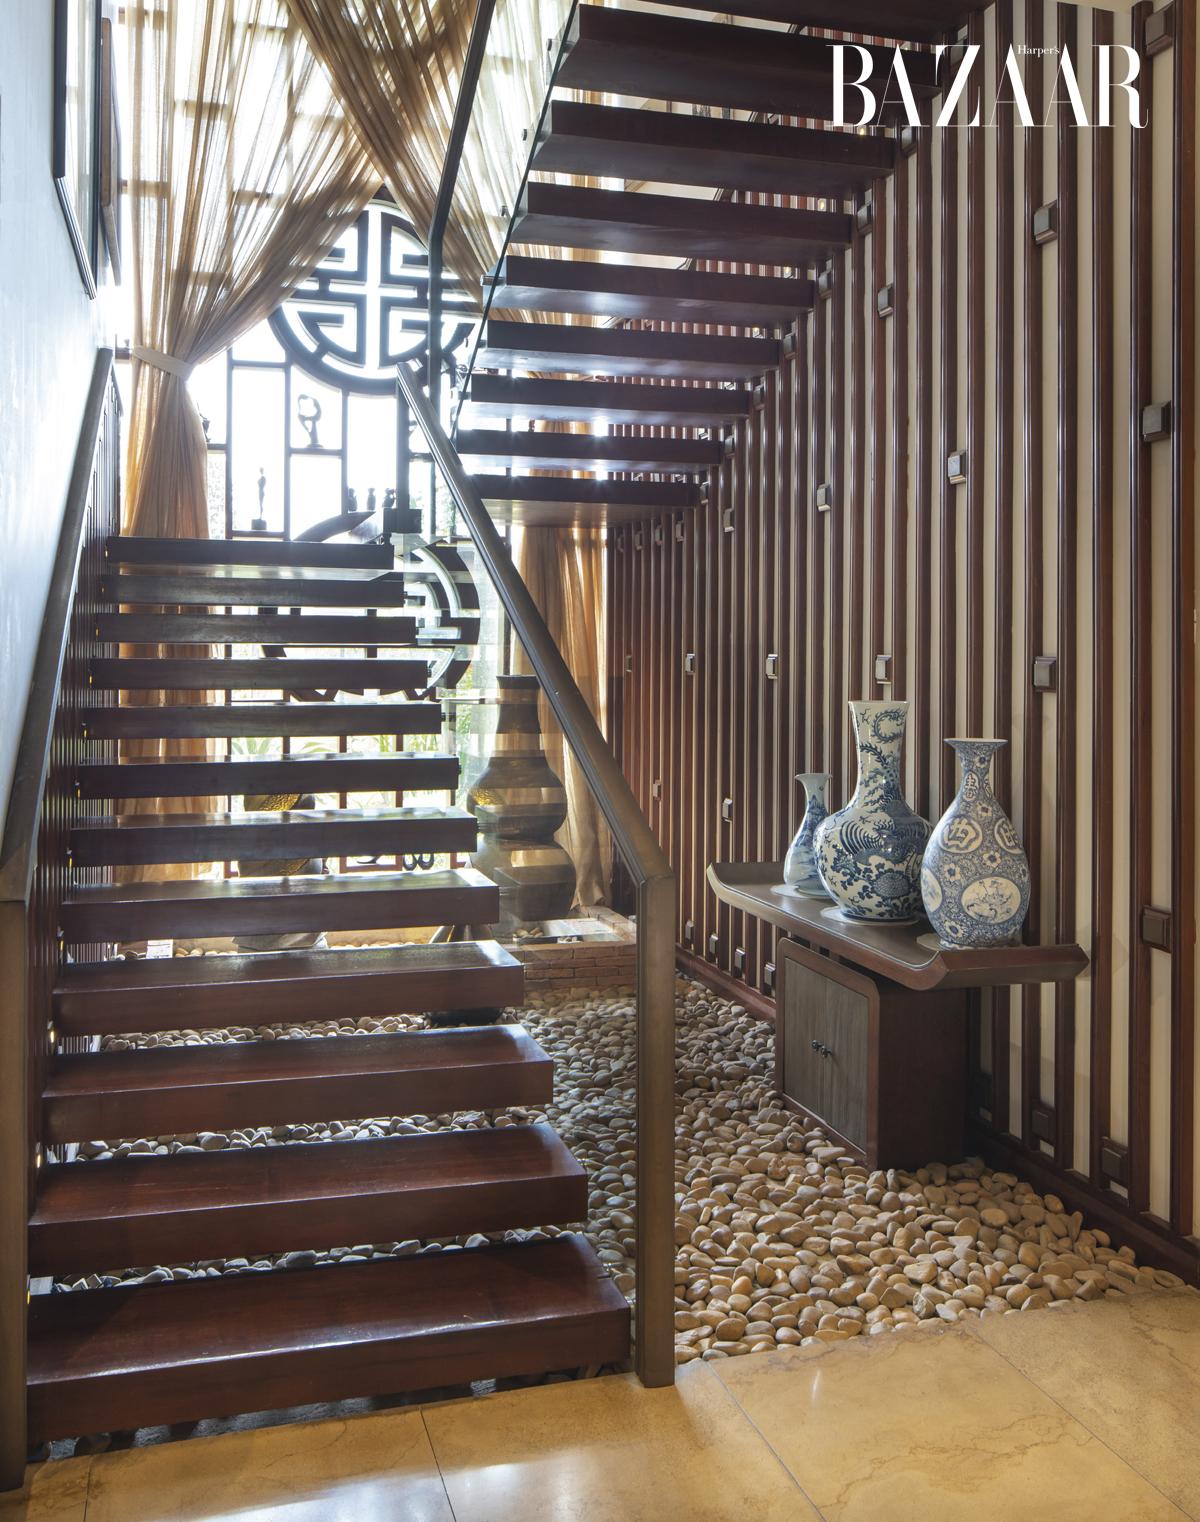 Chi-Cao-Bao-Trâm_stairs